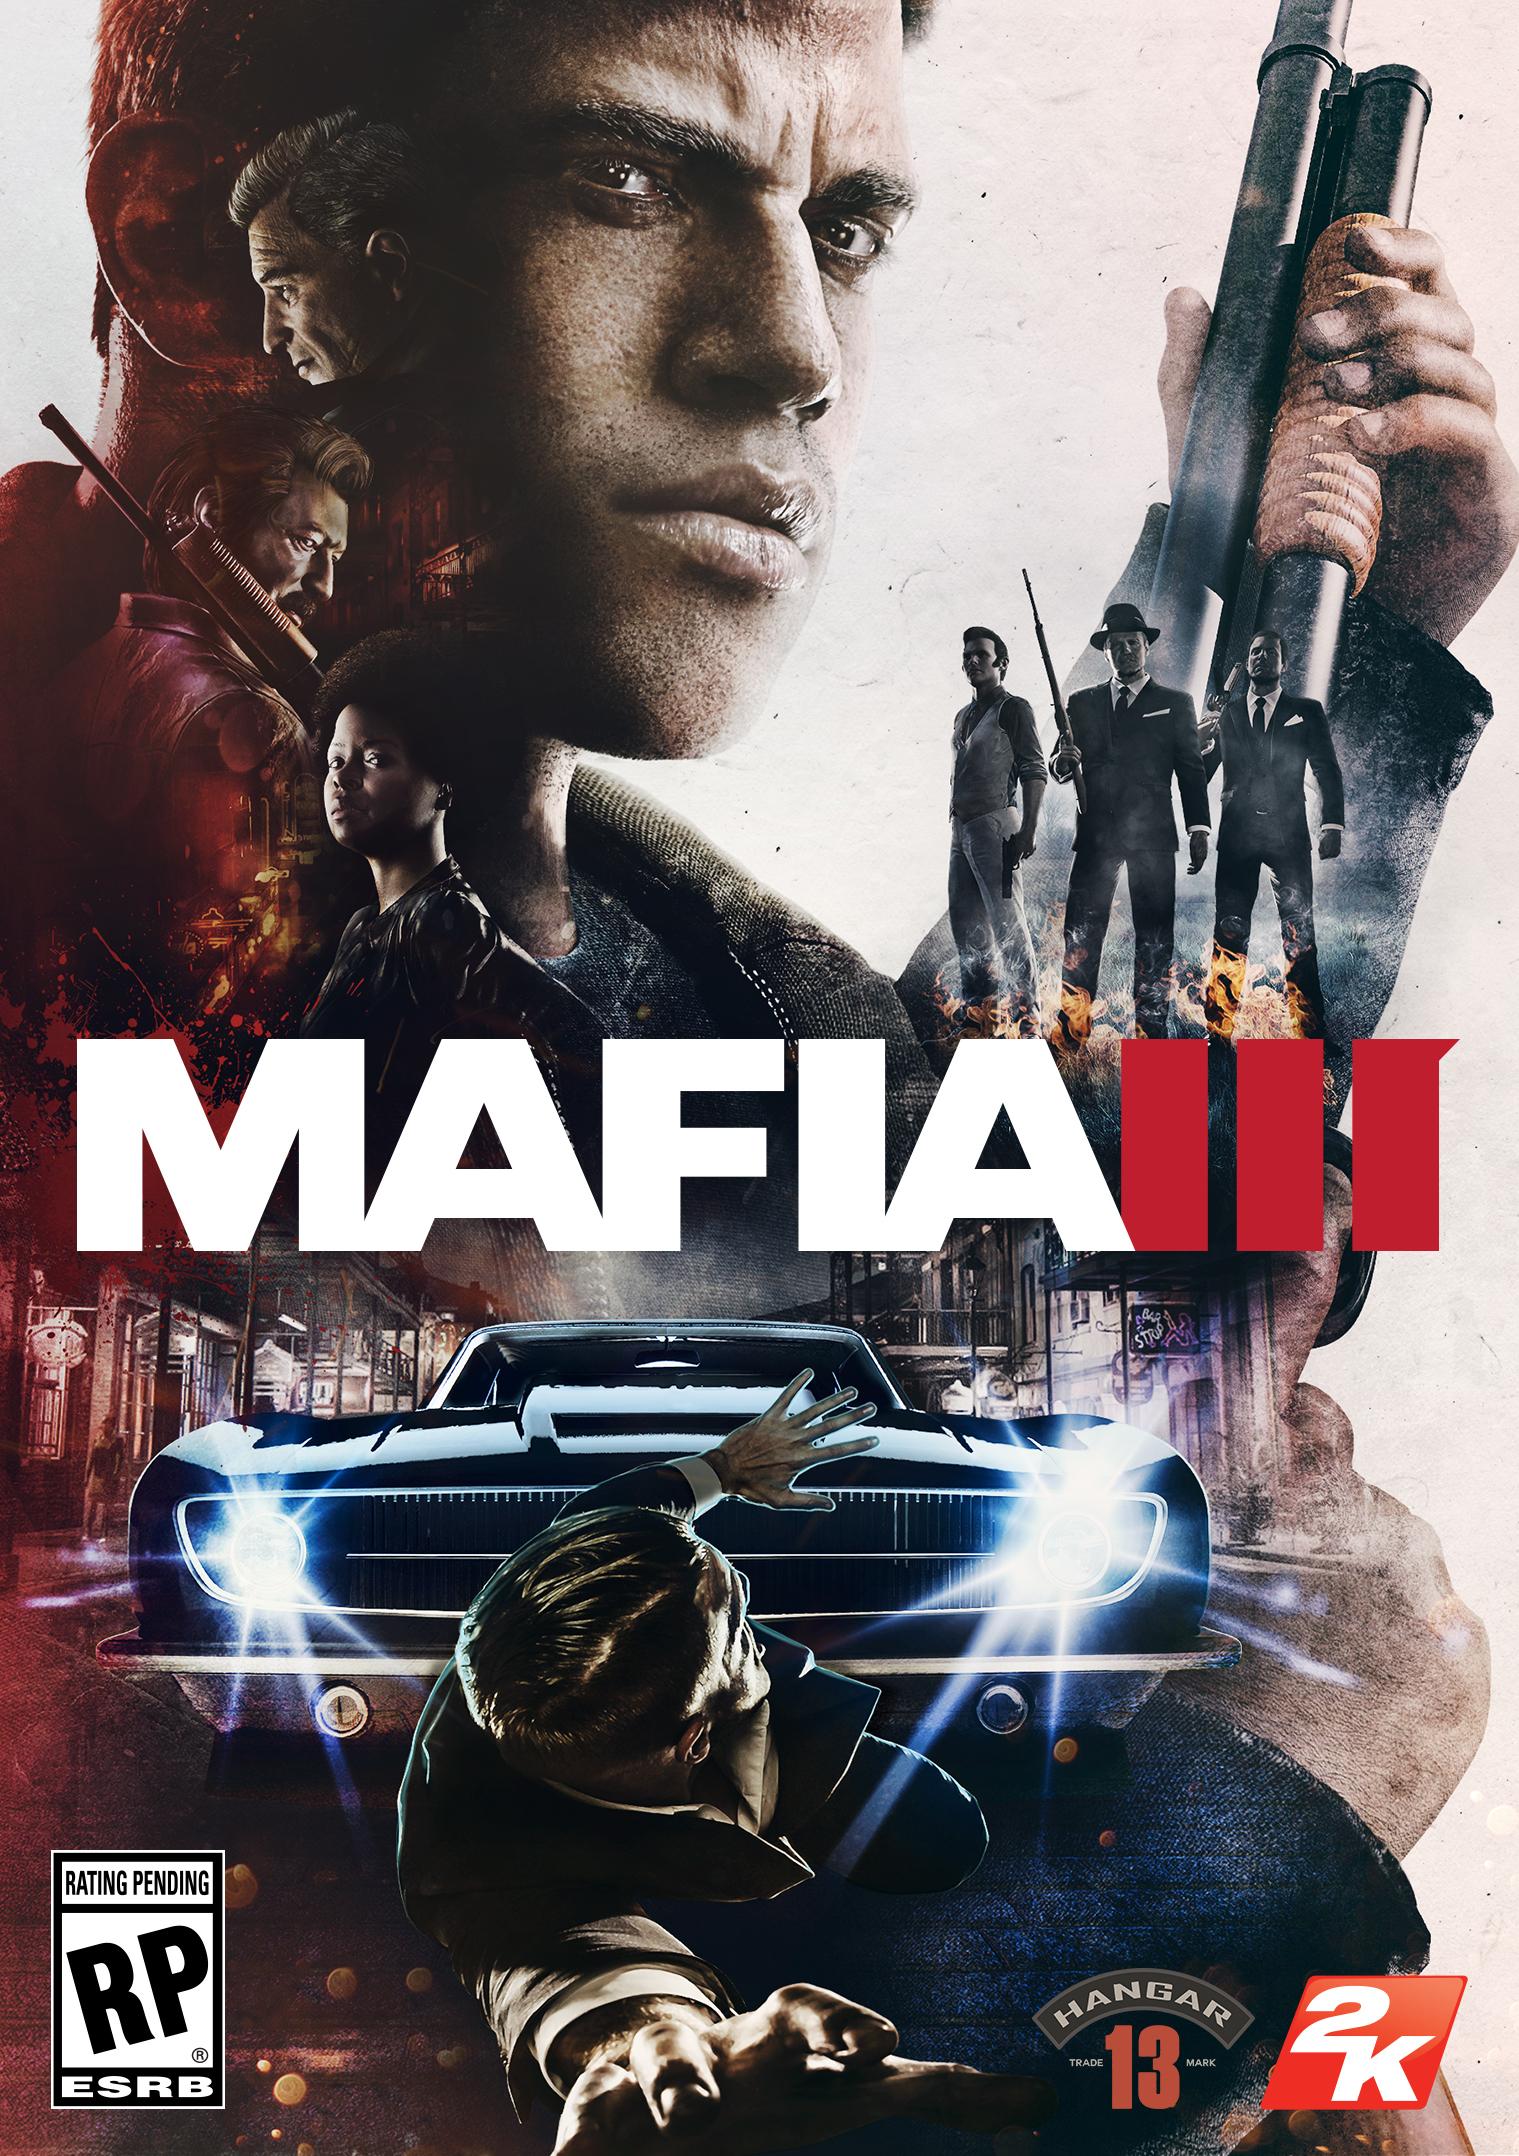 Amazoncom Mafia Iii Online Game Code Video Games